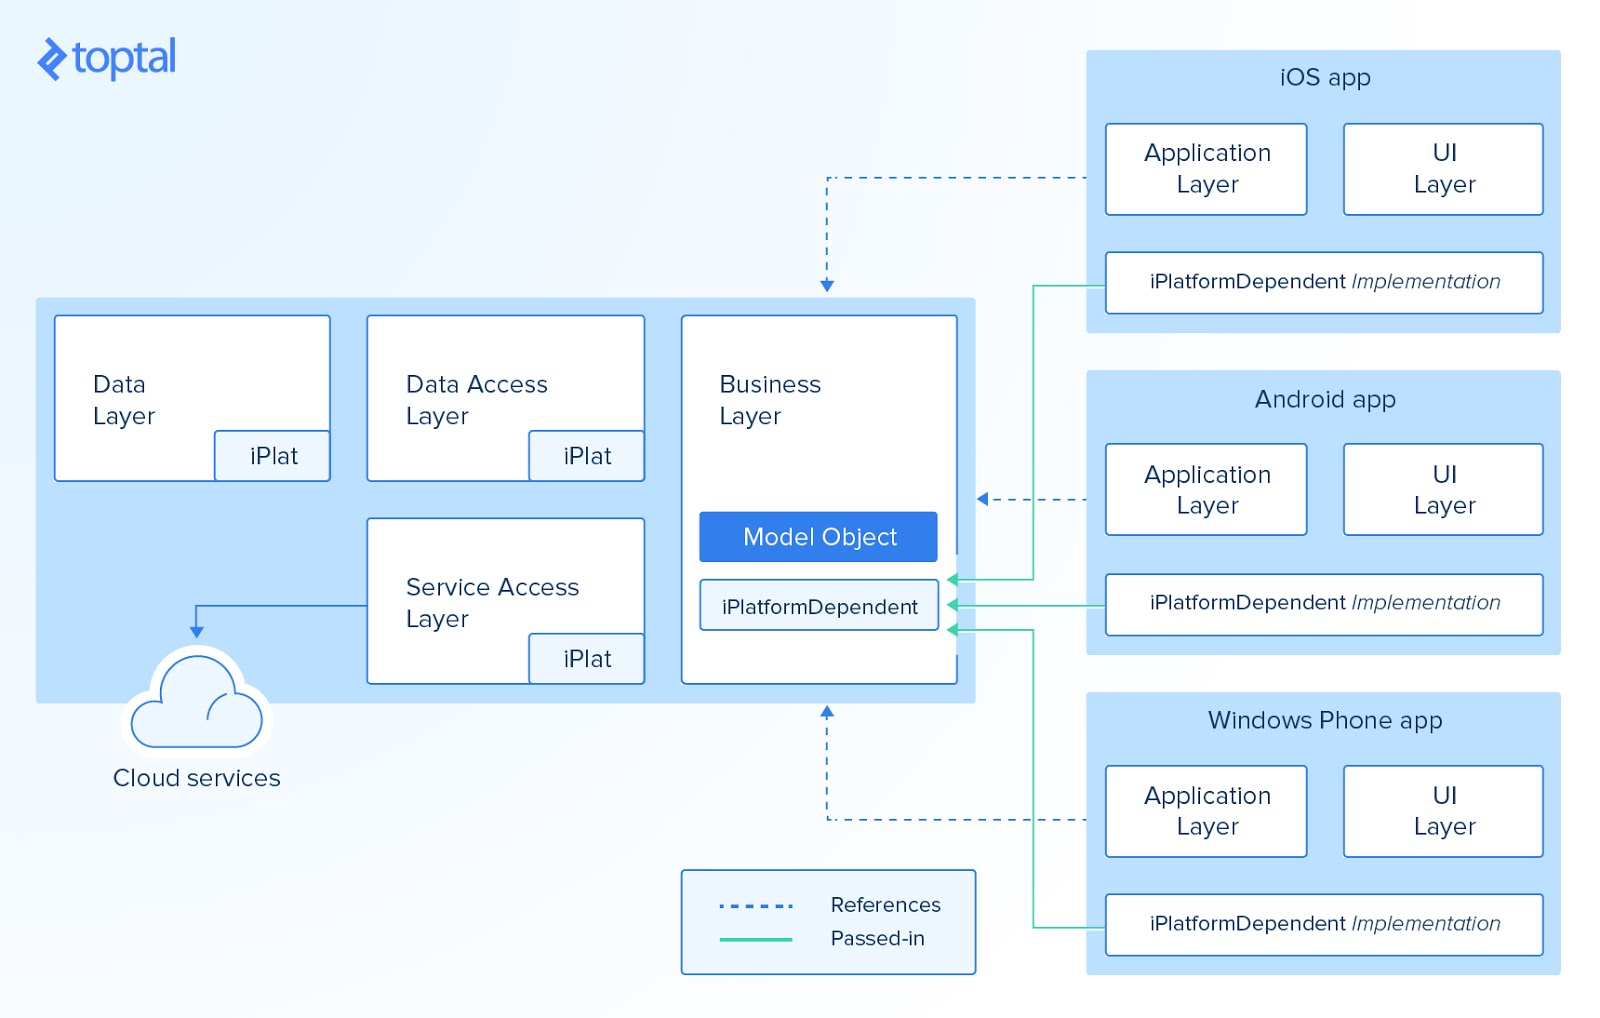 Construyendo aplicaciones multiplataforma con xamarin for Xamarin architecture